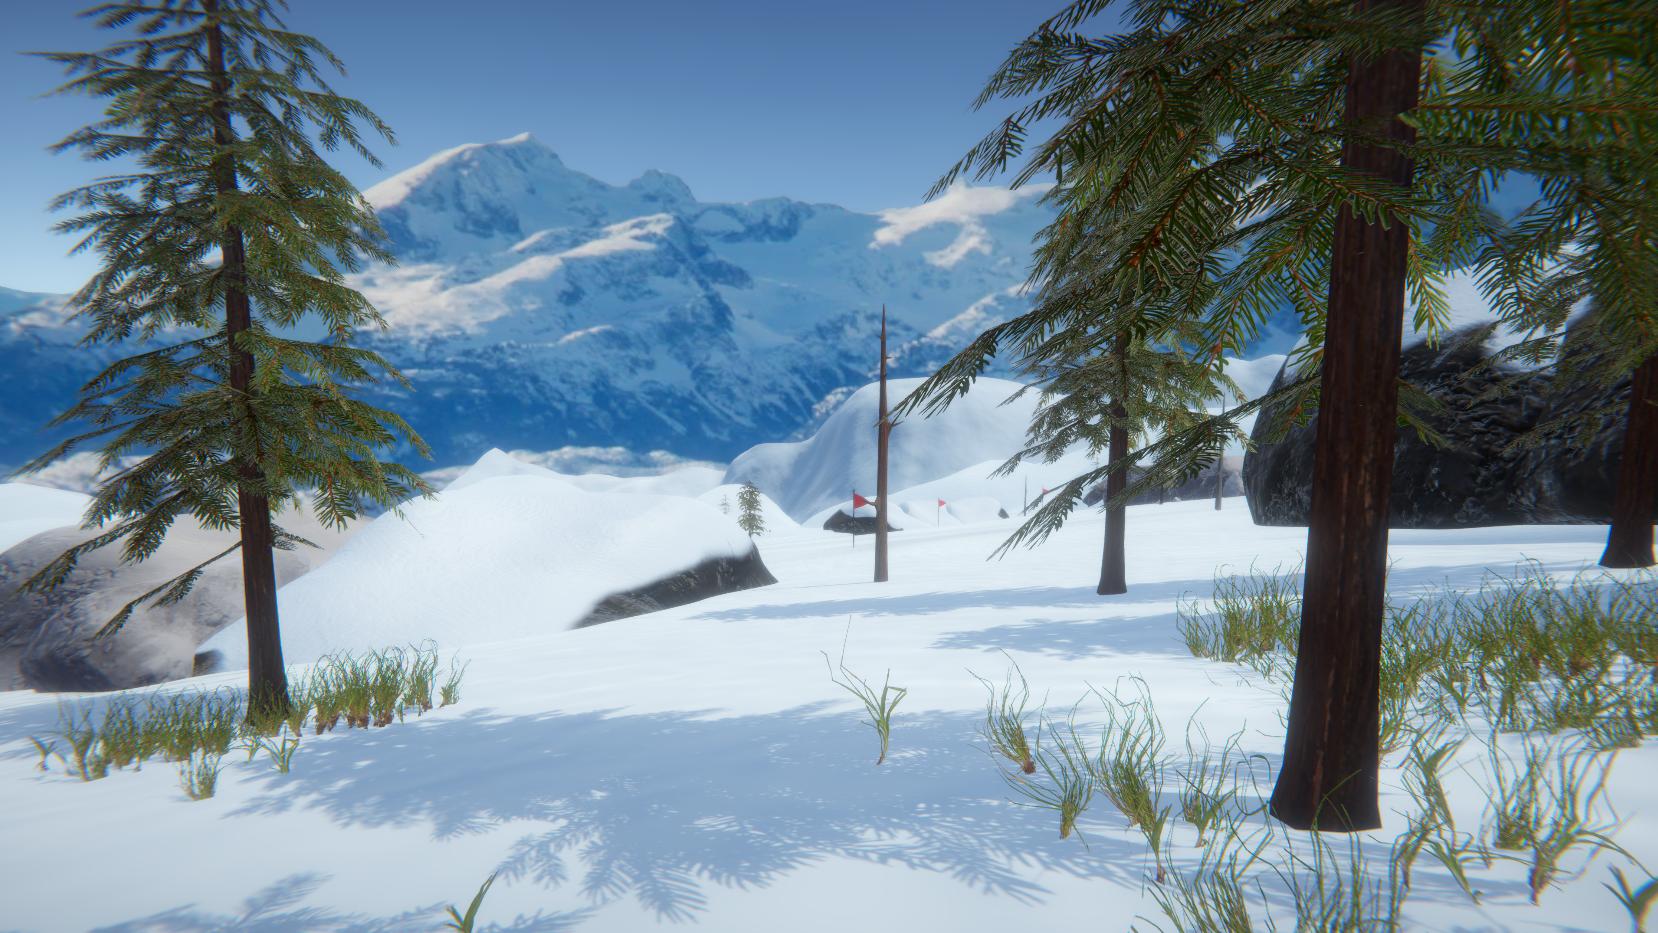 SnowboardingScreen04.PNG